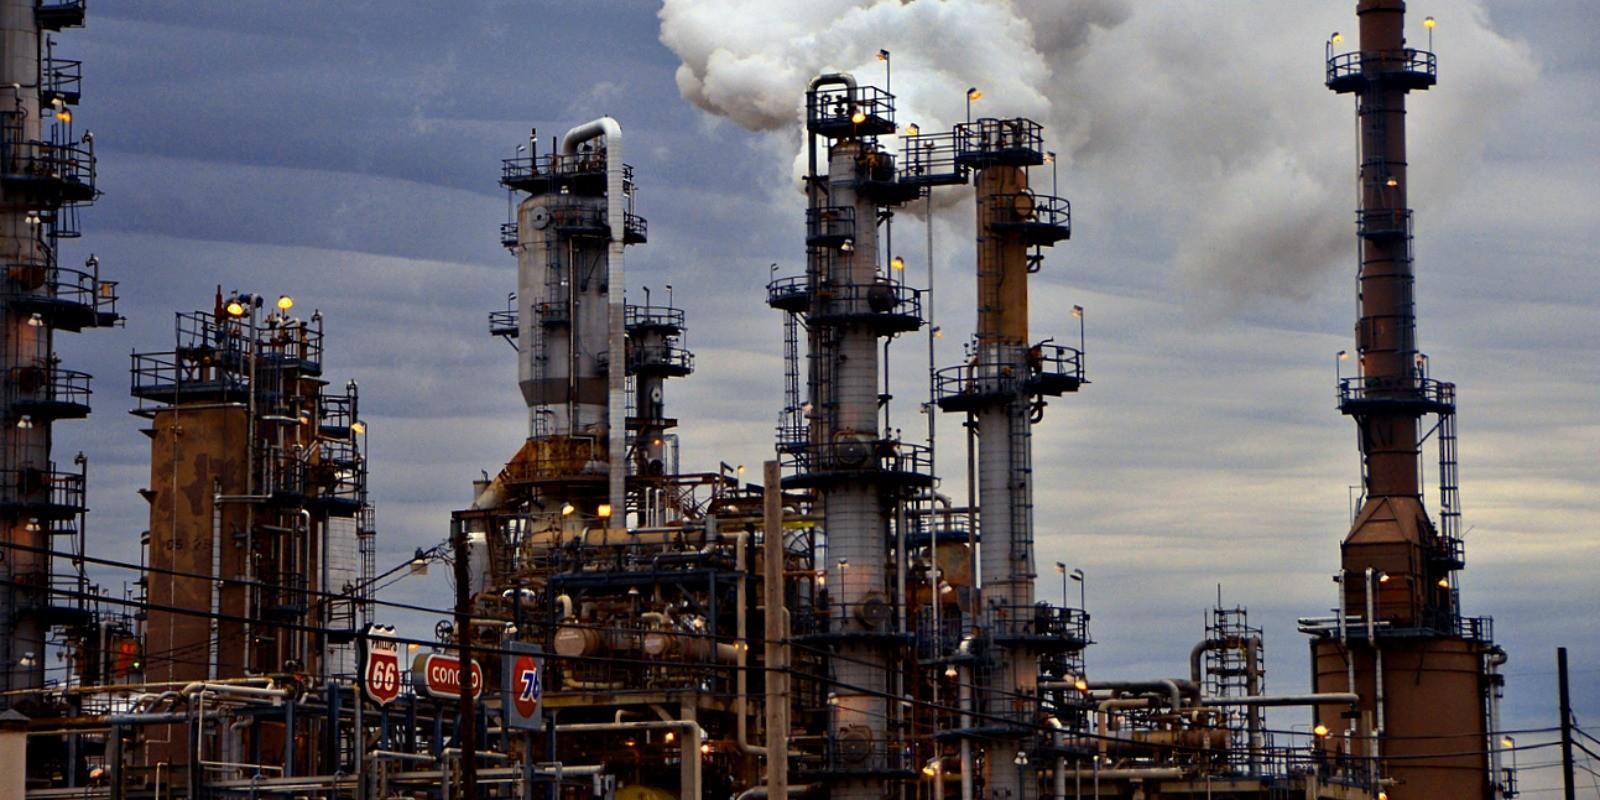 Photo of Resisting Tesoro oil refinery merger in LA County